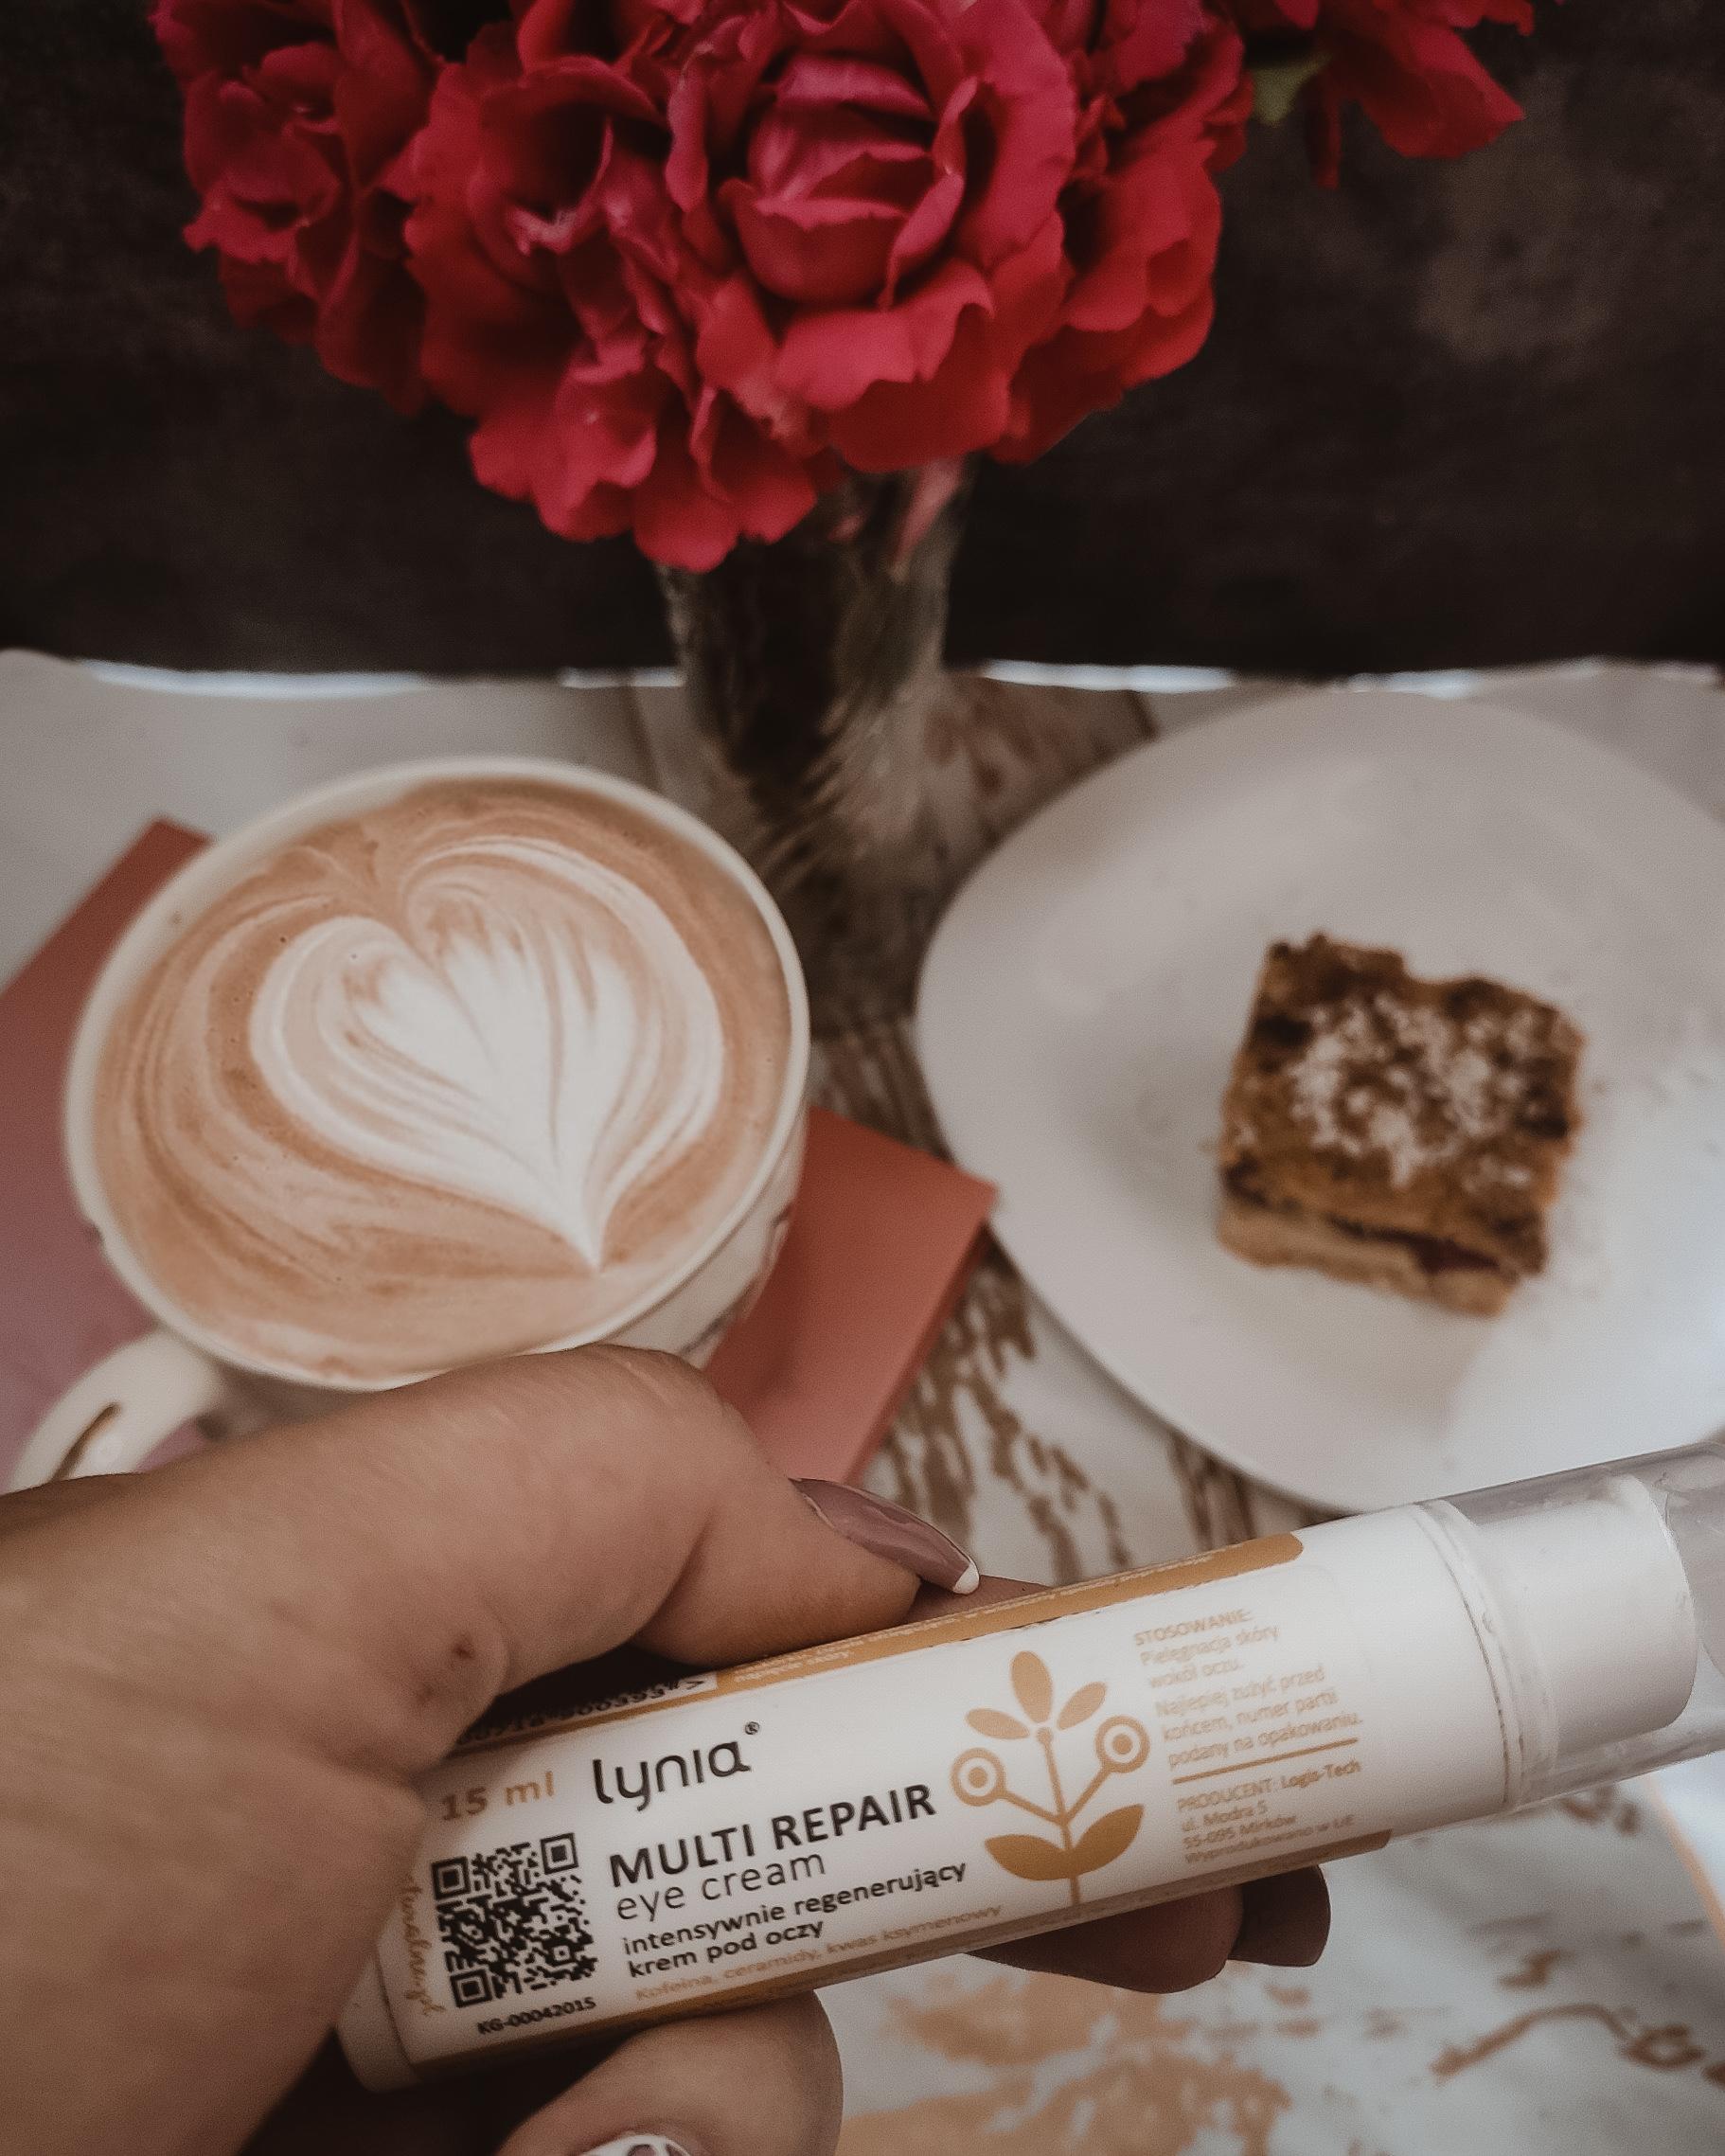 Lynia multi repair Eye cream